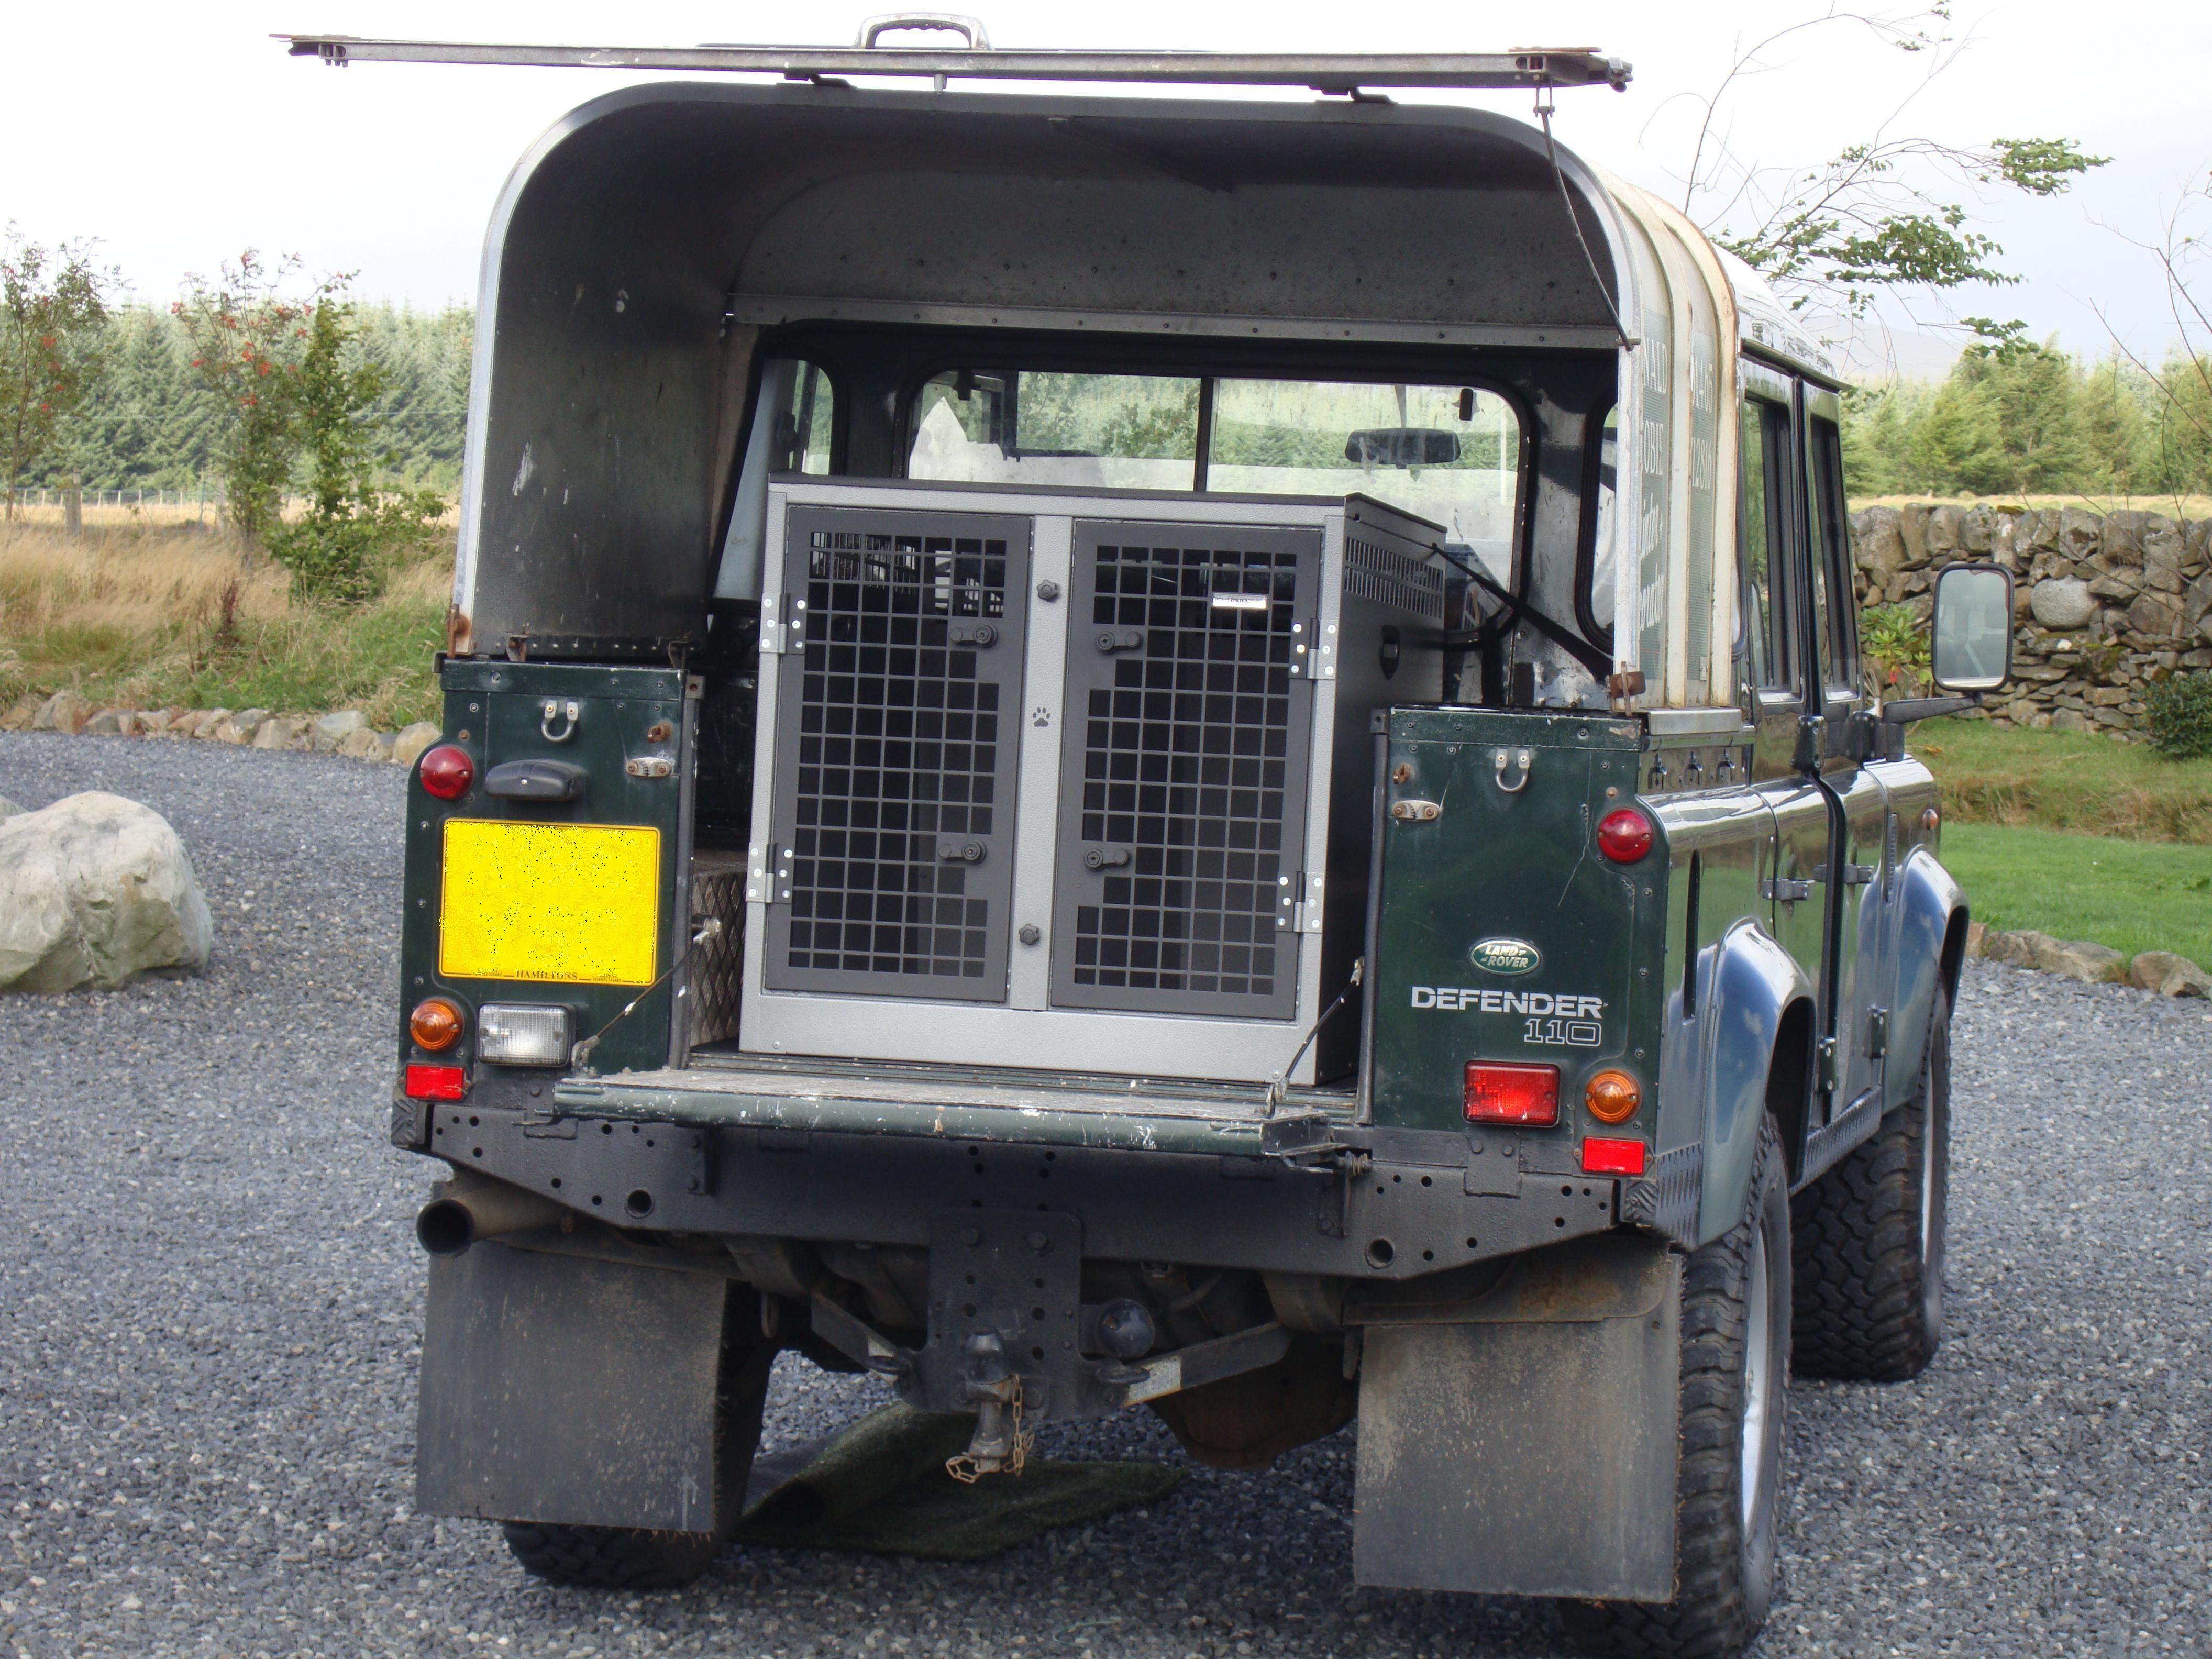 Transk9 B8 Land Rover Defender Dog Transit Box Dog Cage